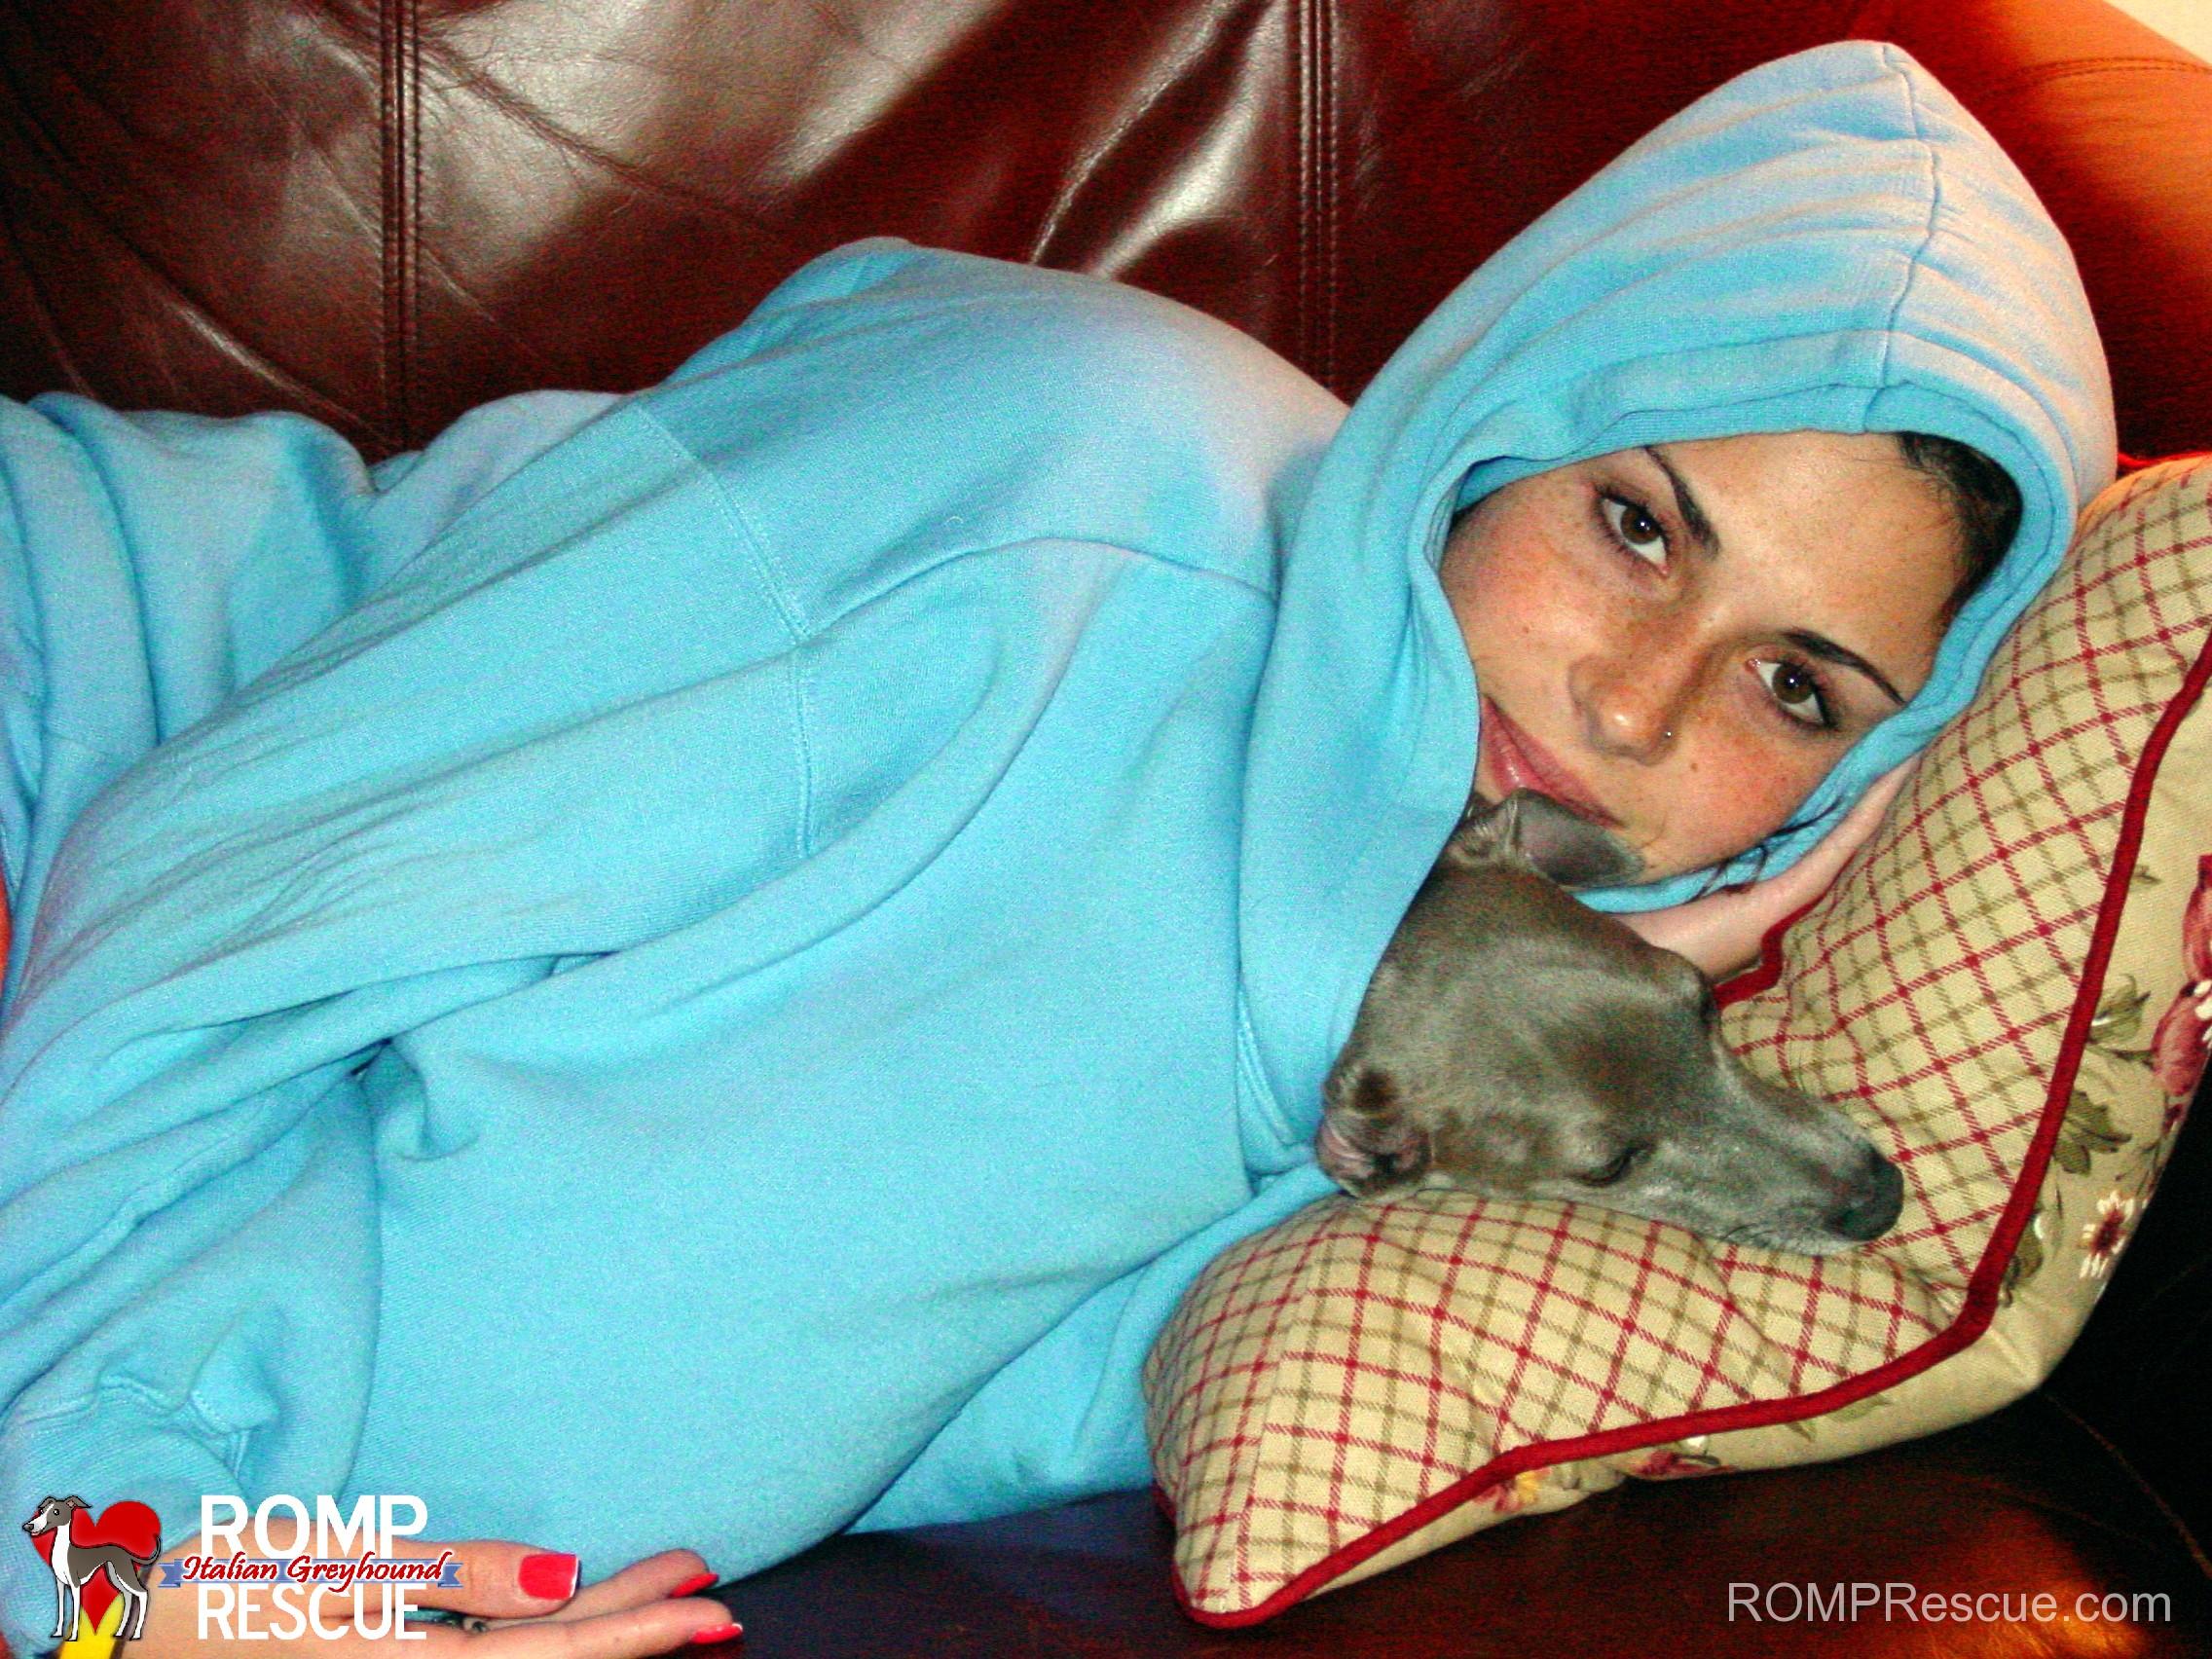 Italian greyhound, sweater, shirt, in, inside, snuggling, snuggle, sleep, coat, top, blouse